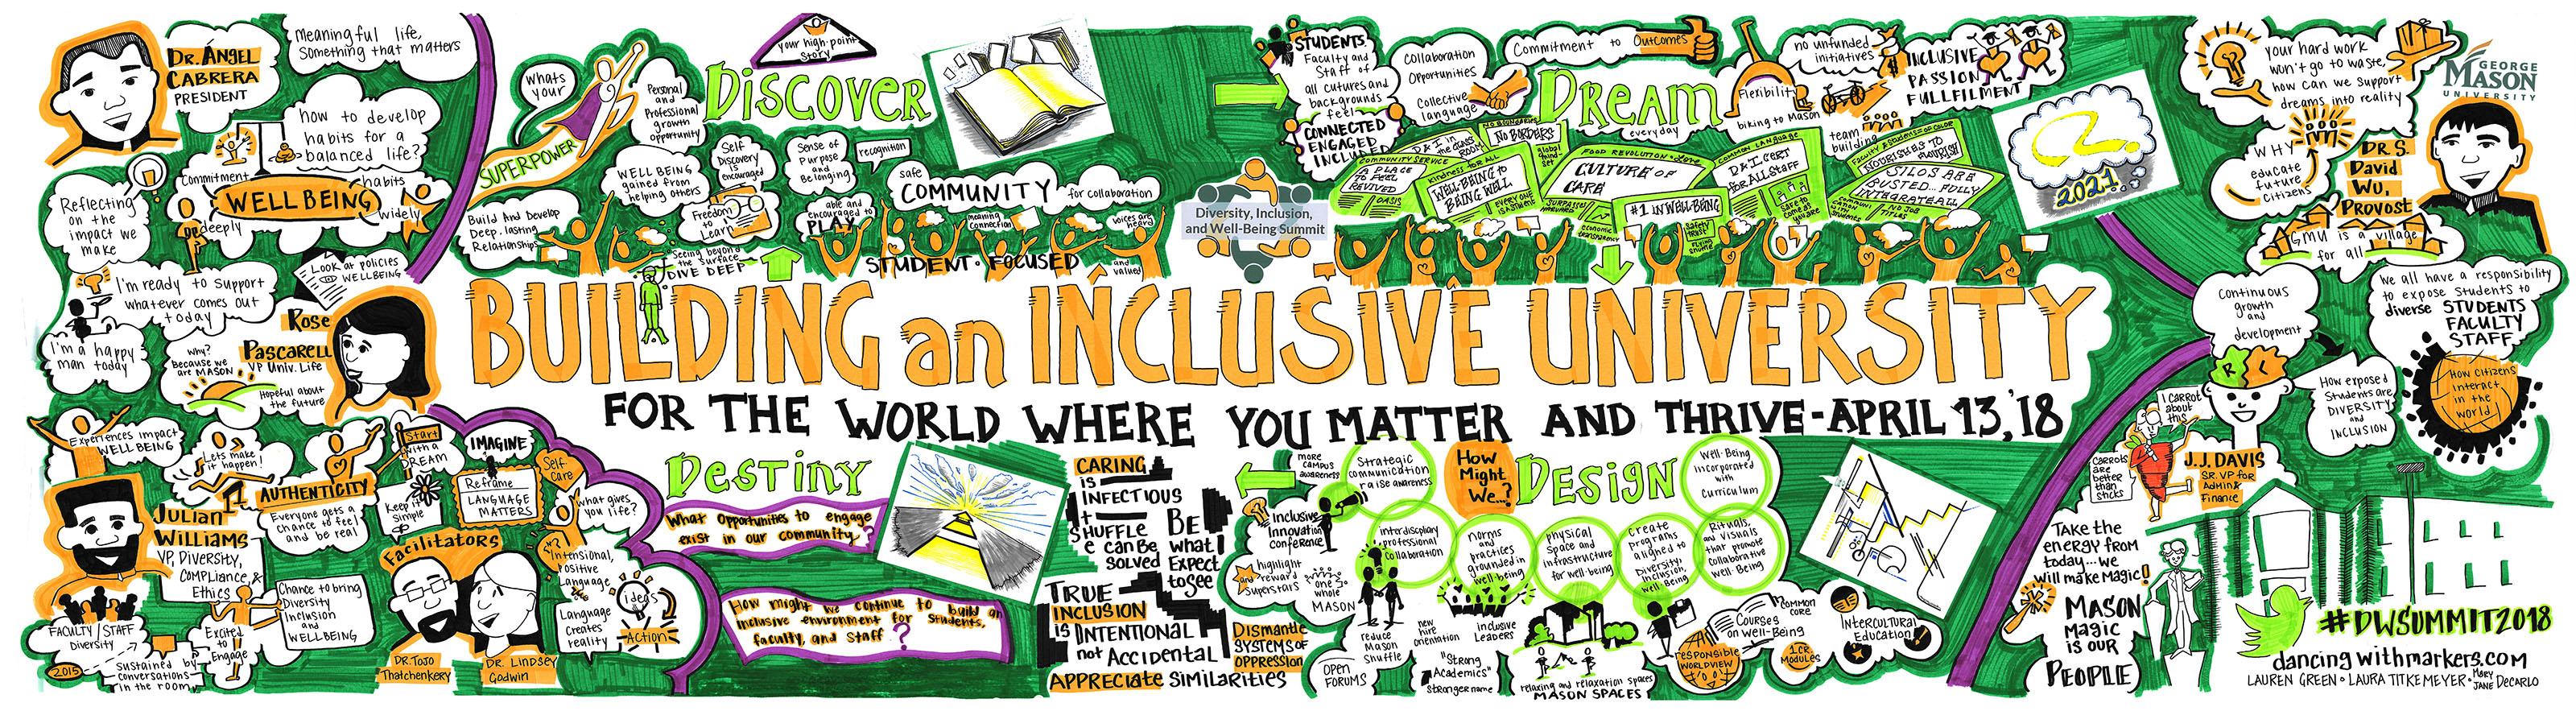 Building an Inclusive University Graphic Recording